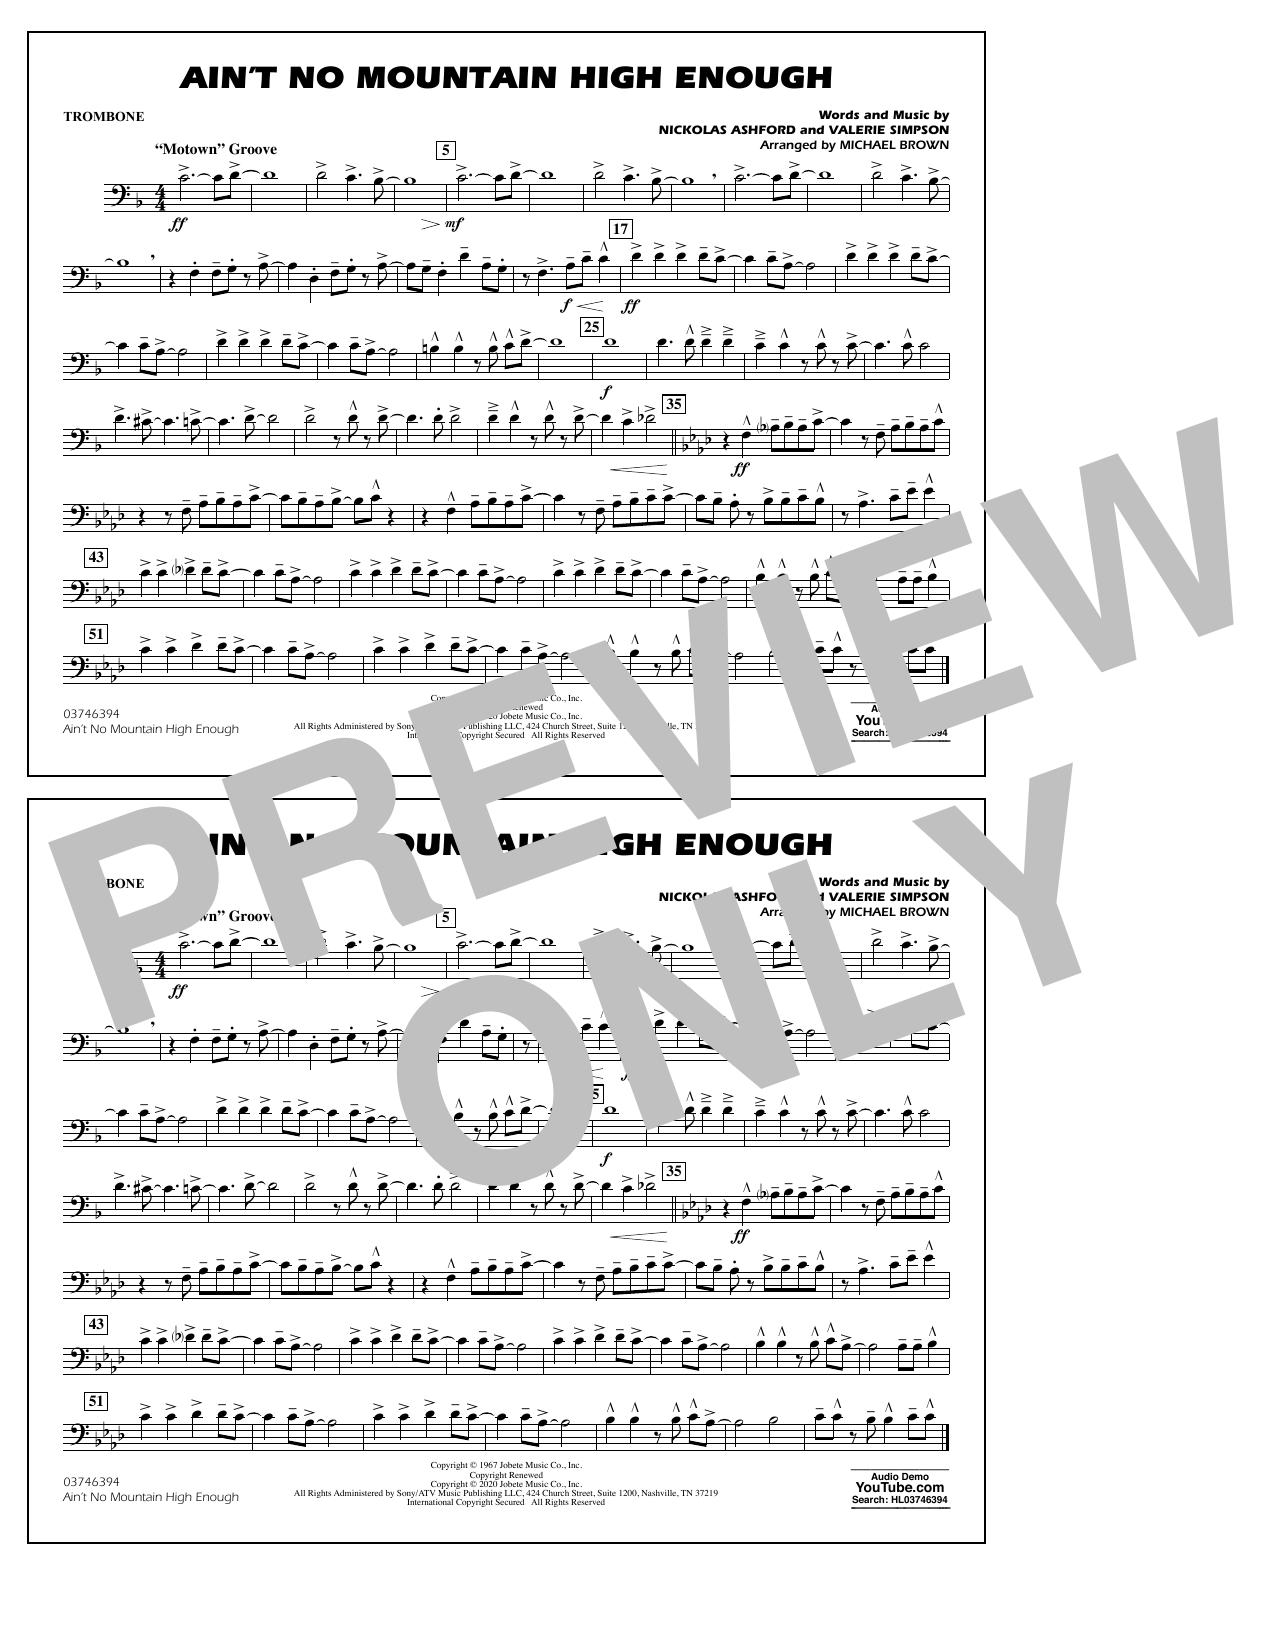 Ain't No Mountain High Enough (arr. Michael Brown) - Trombone Sheet Music